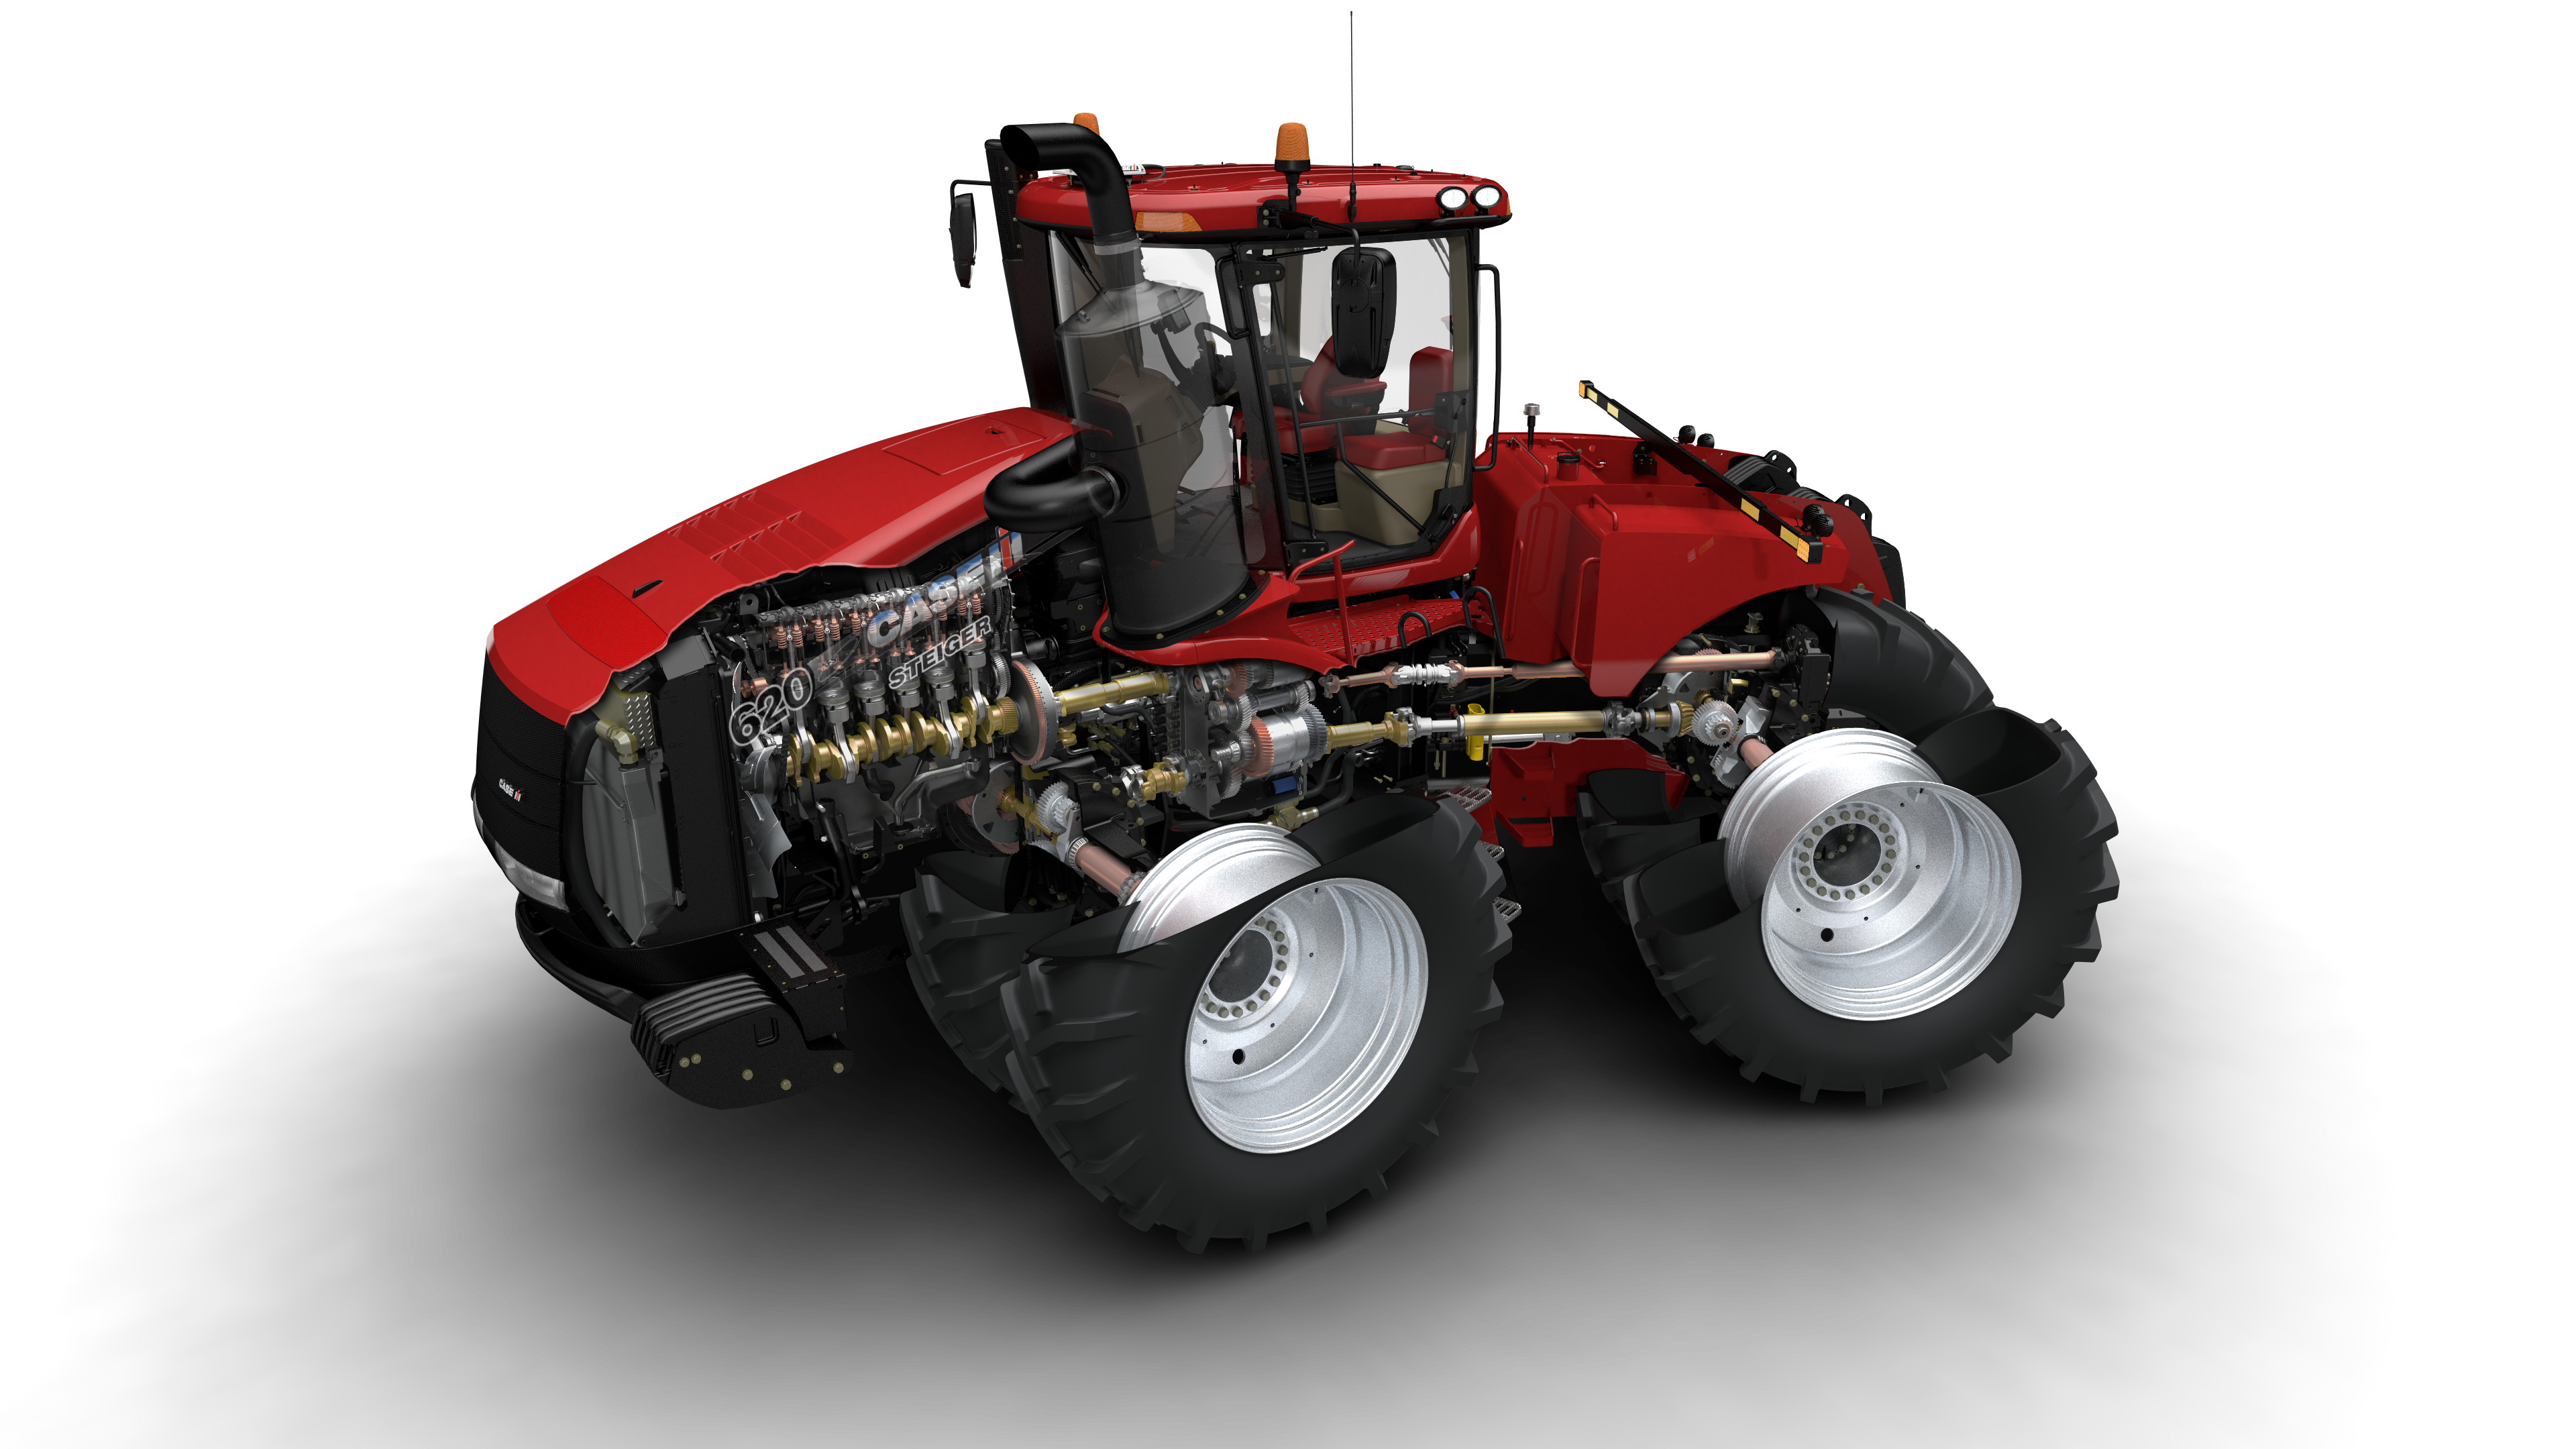 Steiger Series 4wd Row Crop Farming Tractors Case Ih Ford Diesel Tractor  Wiring Diagram Steiger Tractor Wiring Diagram